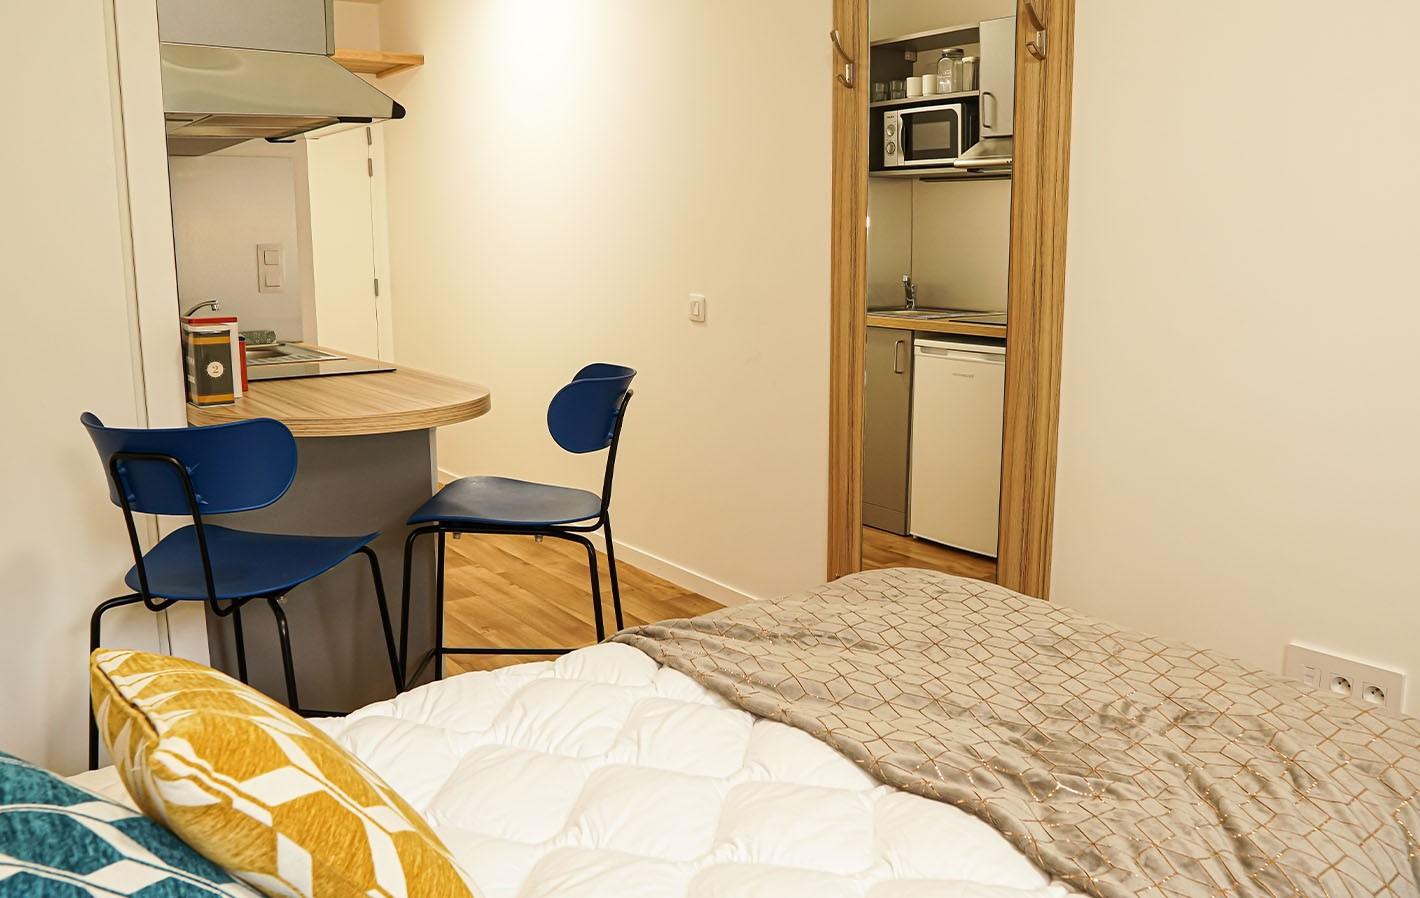 image  2021 03 08 residence etudiante suitetudes streamline boulogne billancourt studio 15